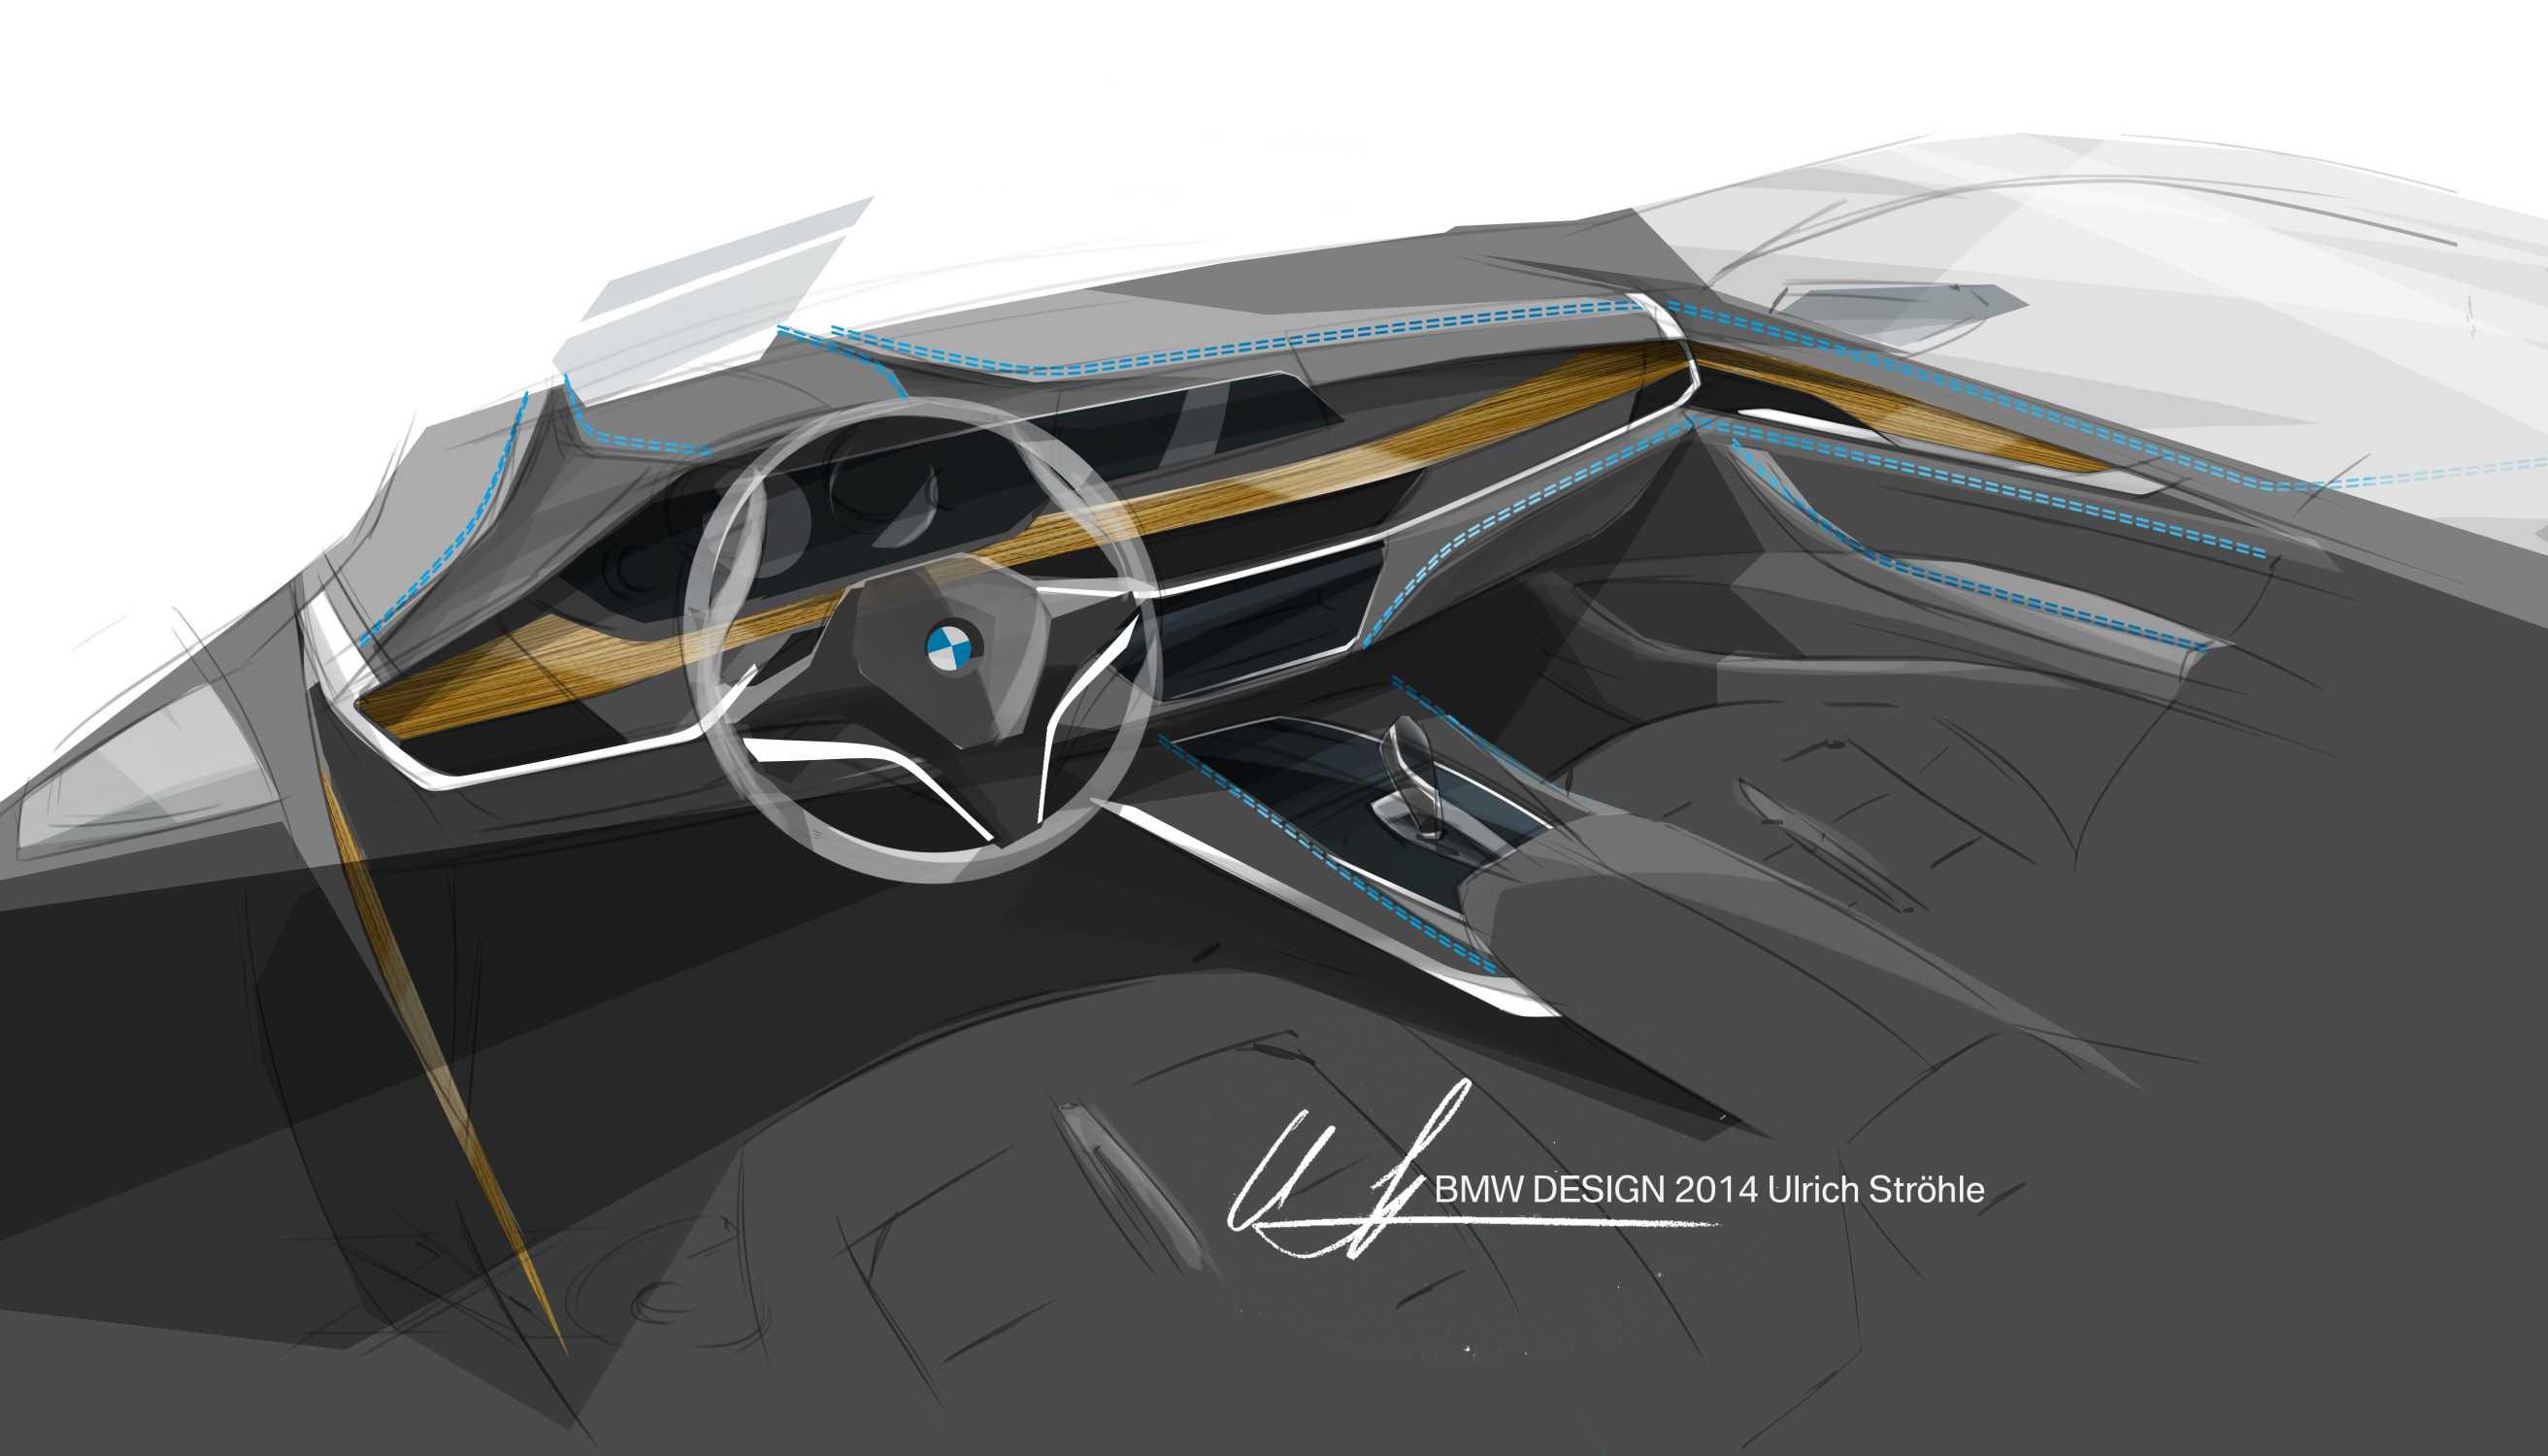 The New Bmw X6 Sketch Interior Design 06 14